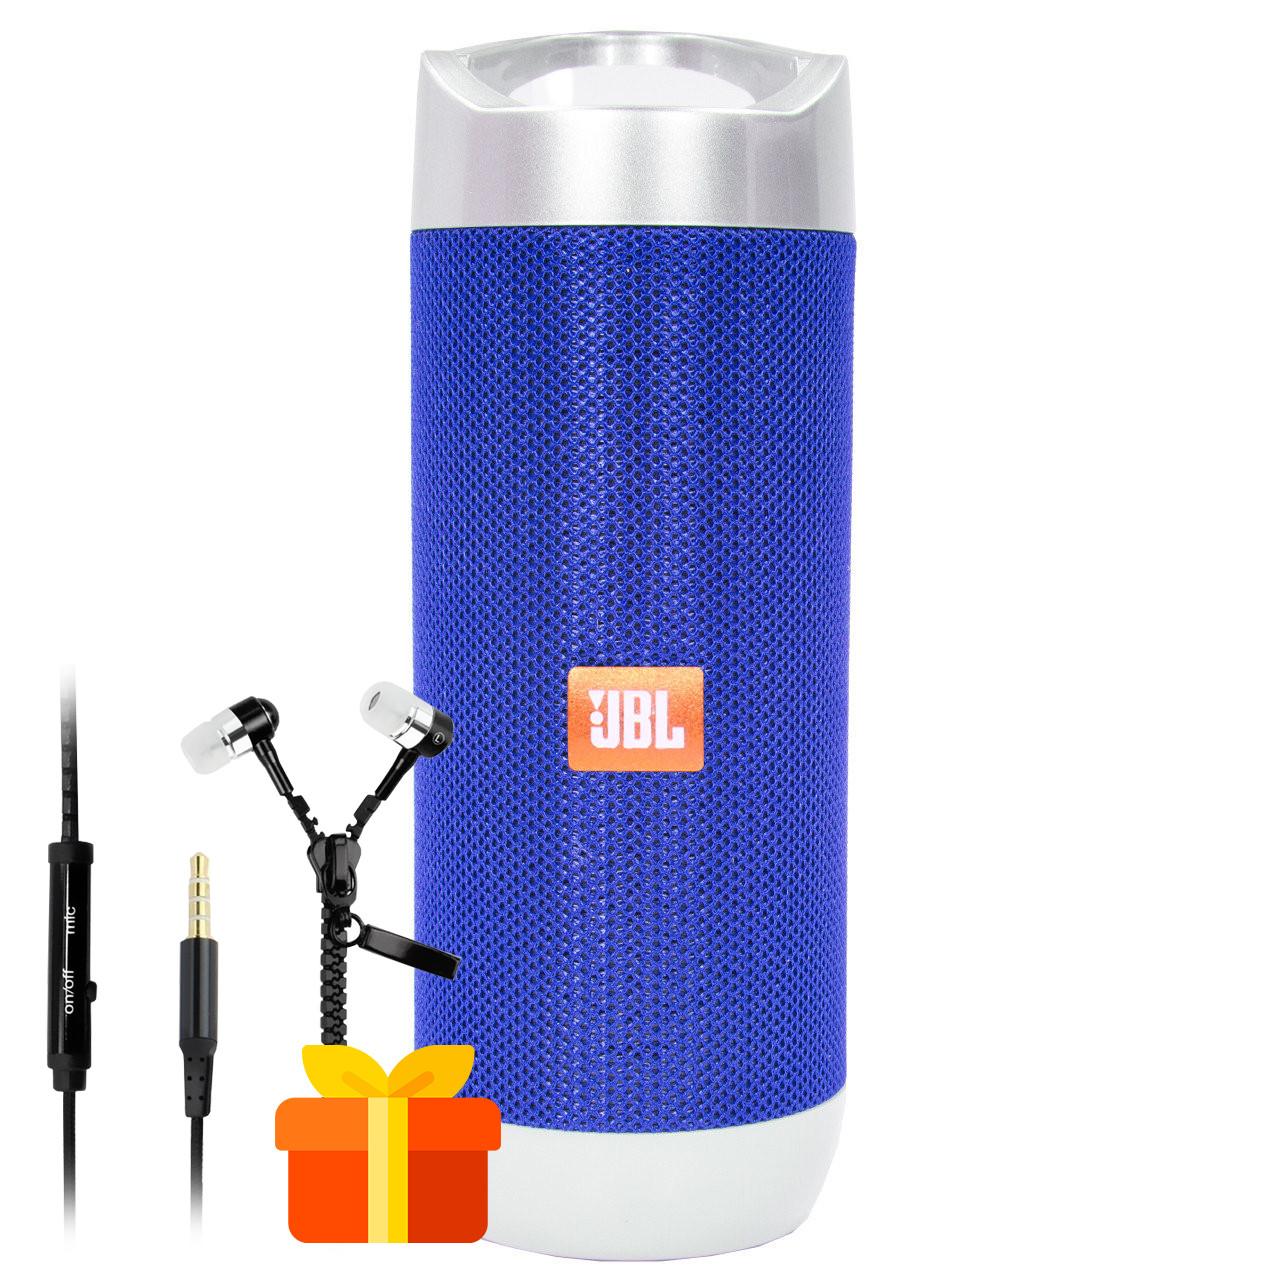 ✸Колонка BL JBL X95 Blue Speakerphone USB флеш microUSB разъем AUX вход мощные динамики беспроводная